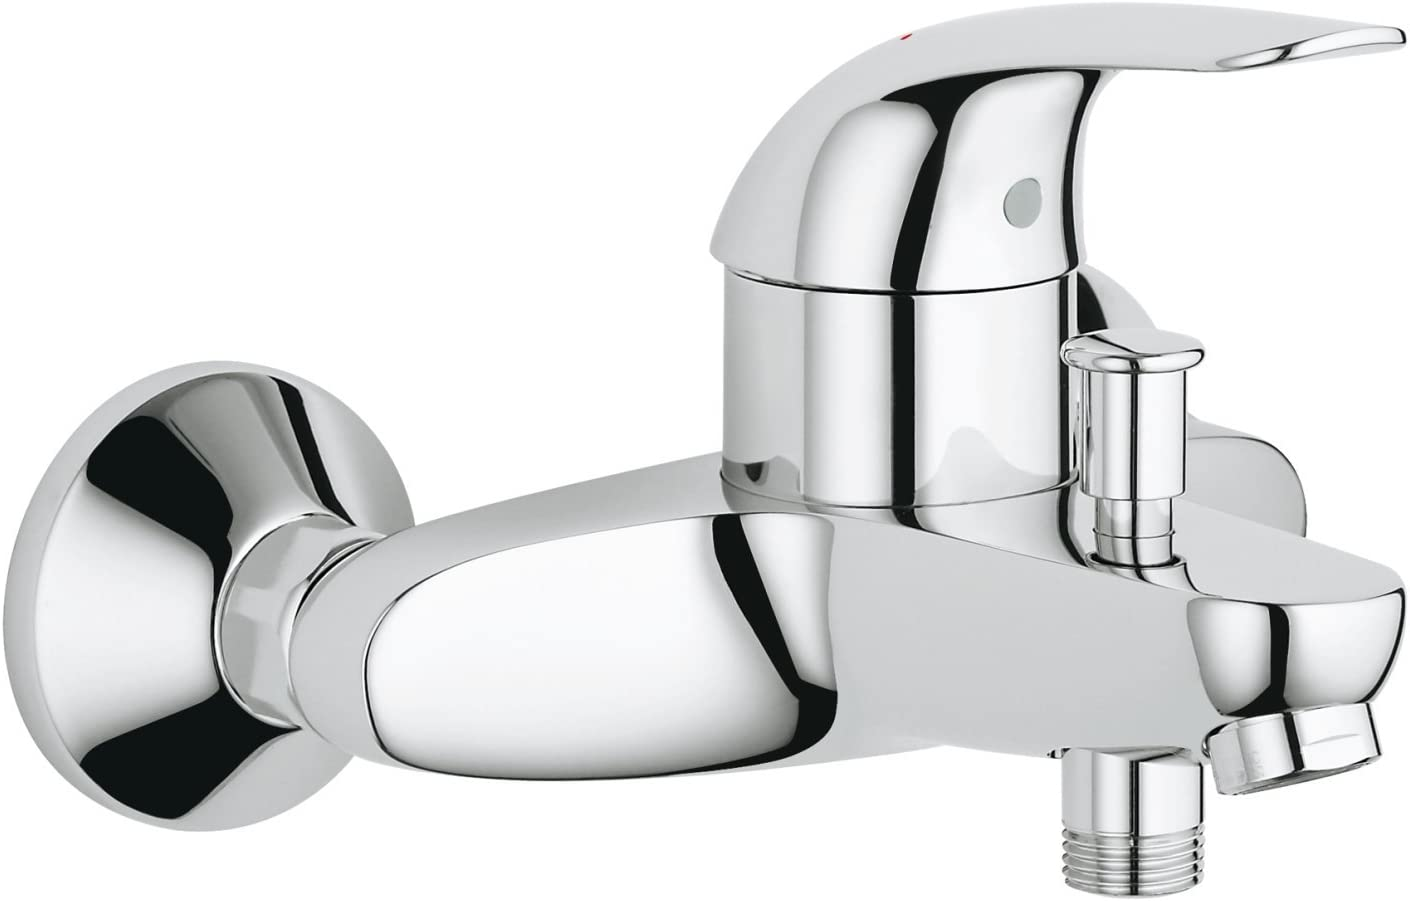 GROHE 32743000 Euroeco Single Lever Bath Mixer